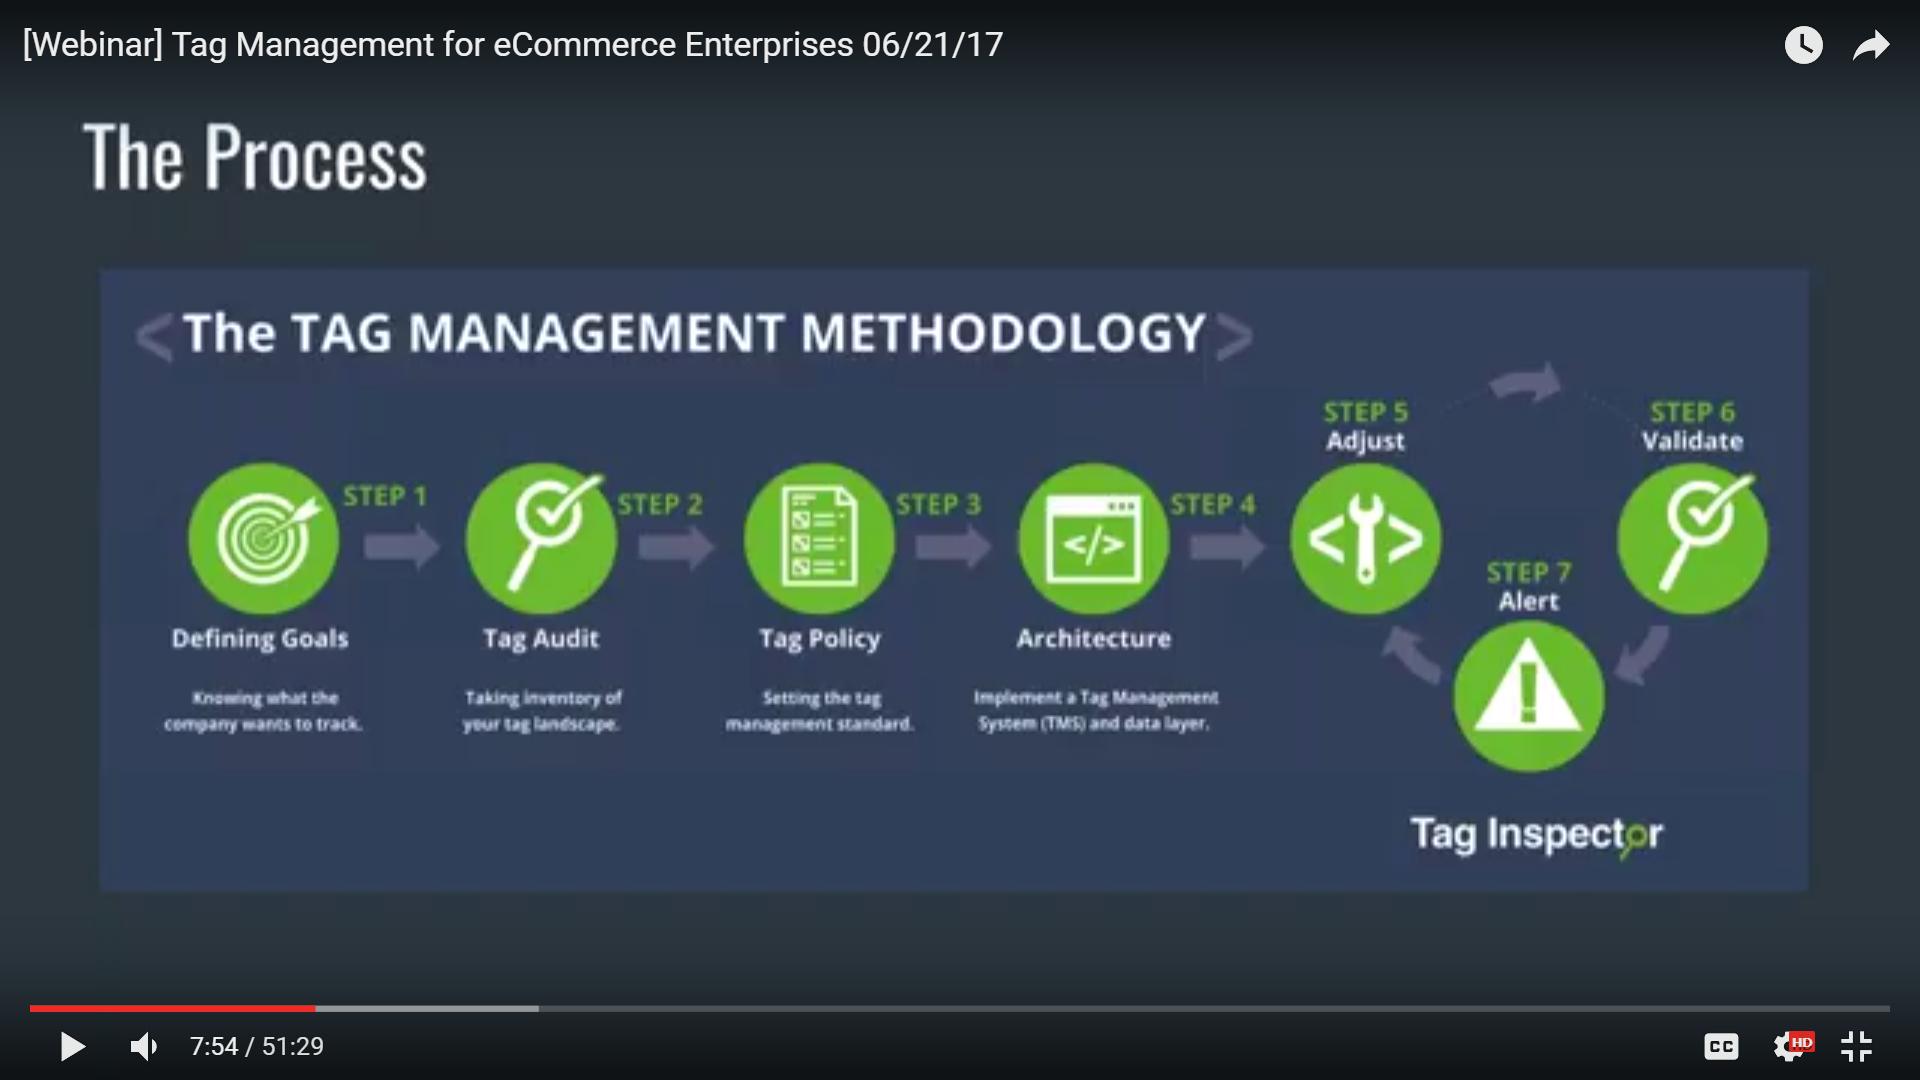 Tag Management for eCommerce Enterprises